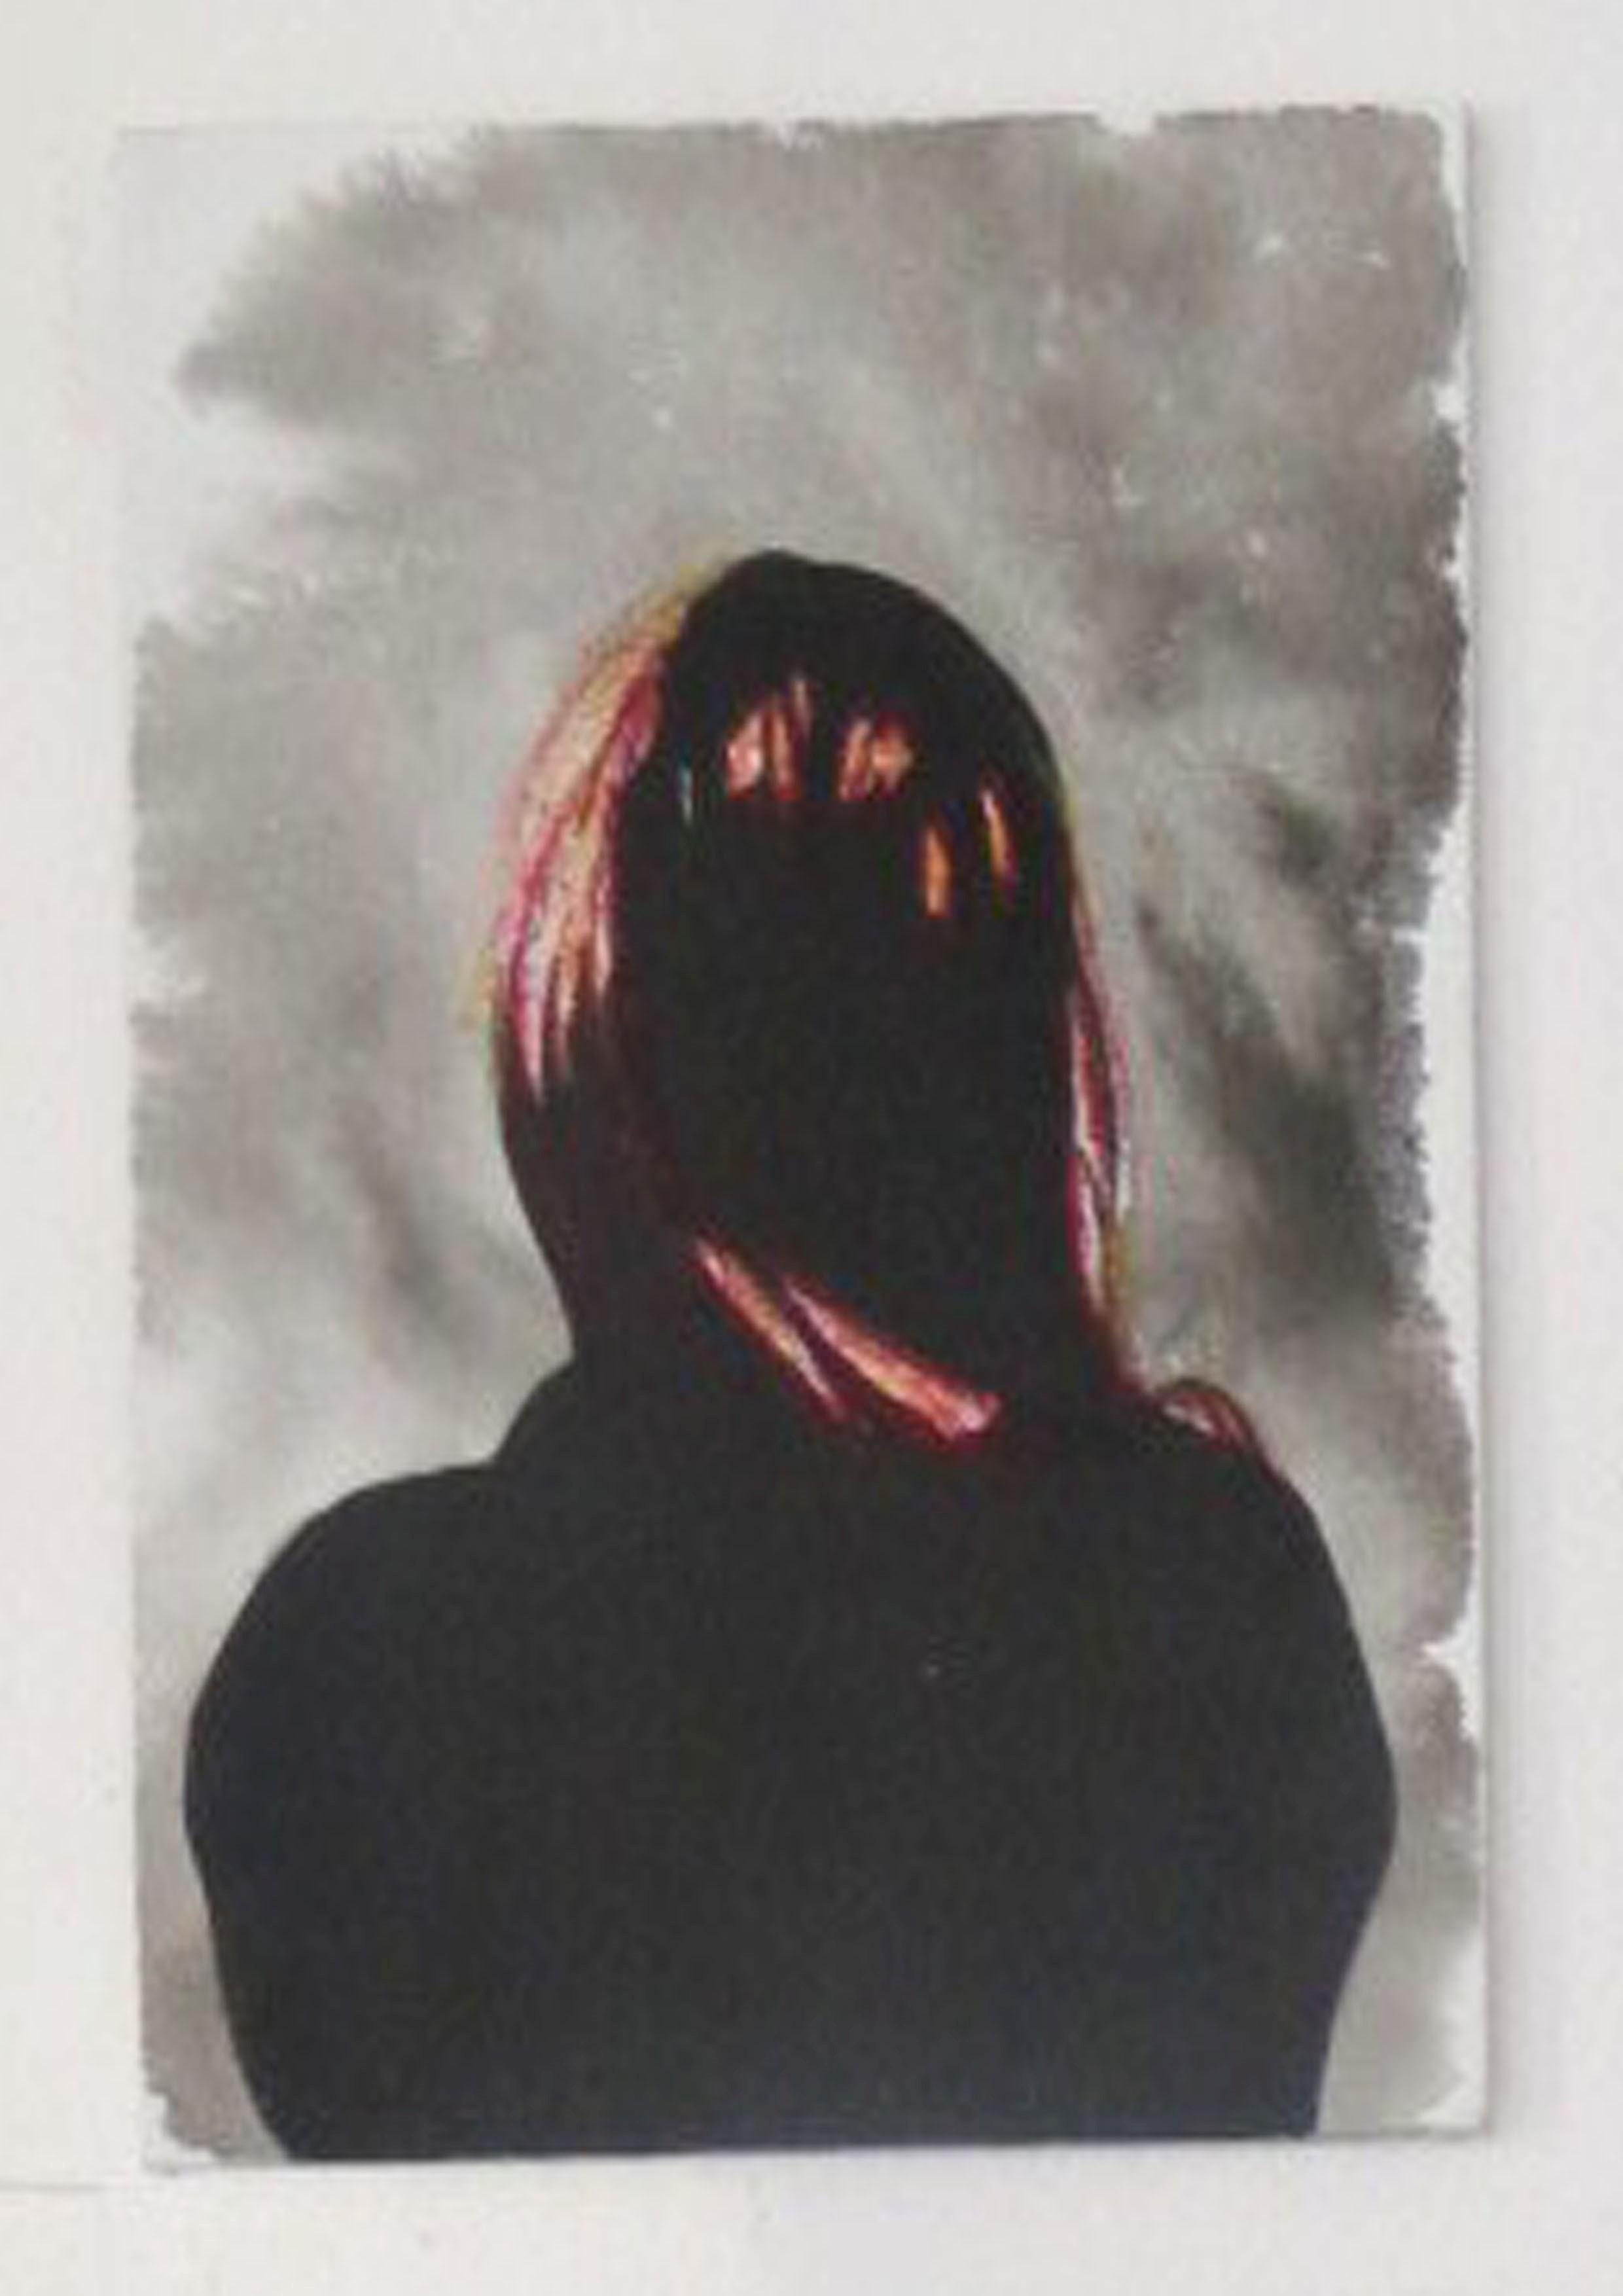 Evanne Souchette